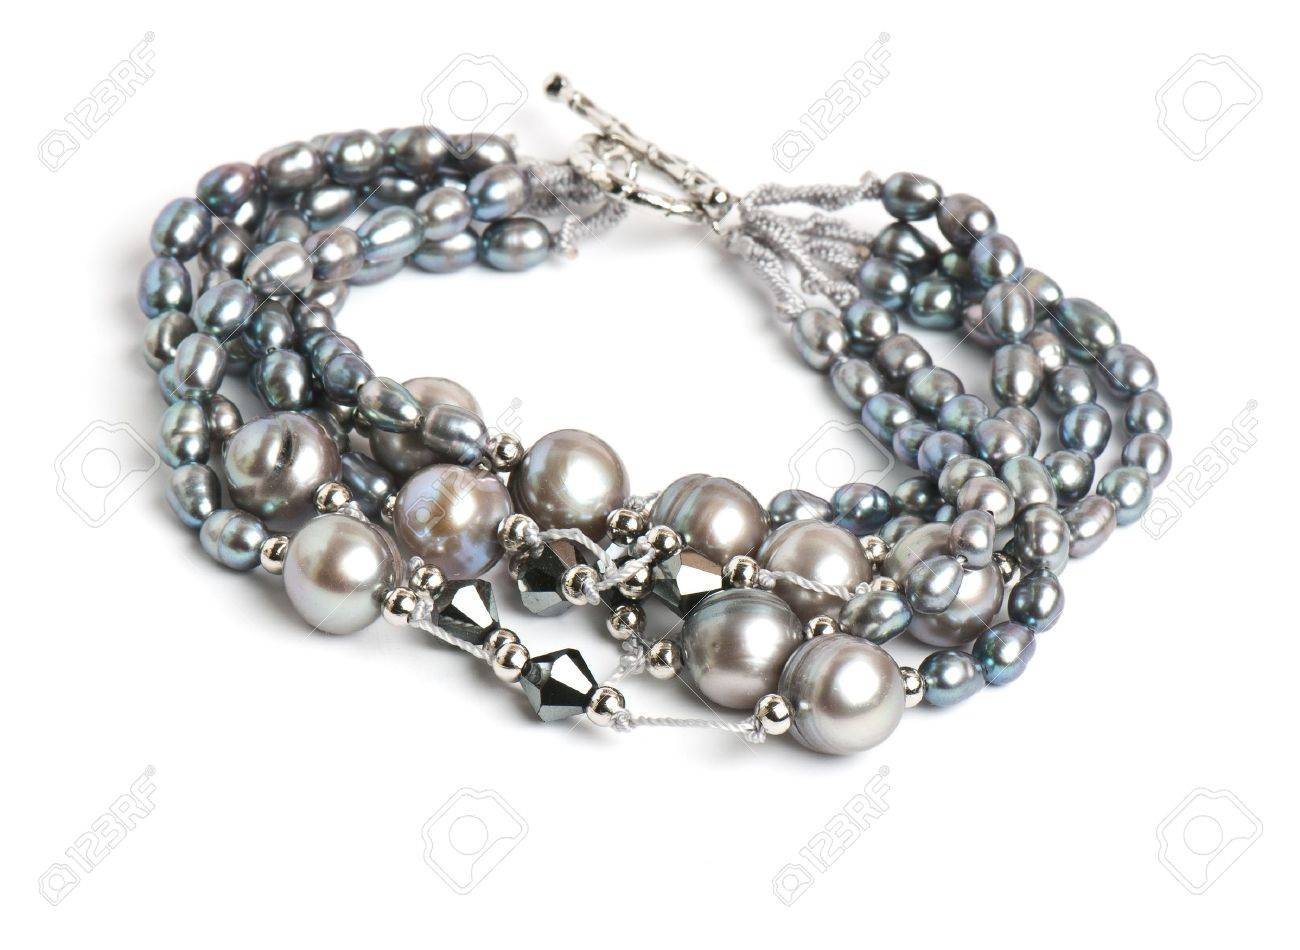 Expensive beautiful bracelet on the white isolated background Stock Photo - 11898904